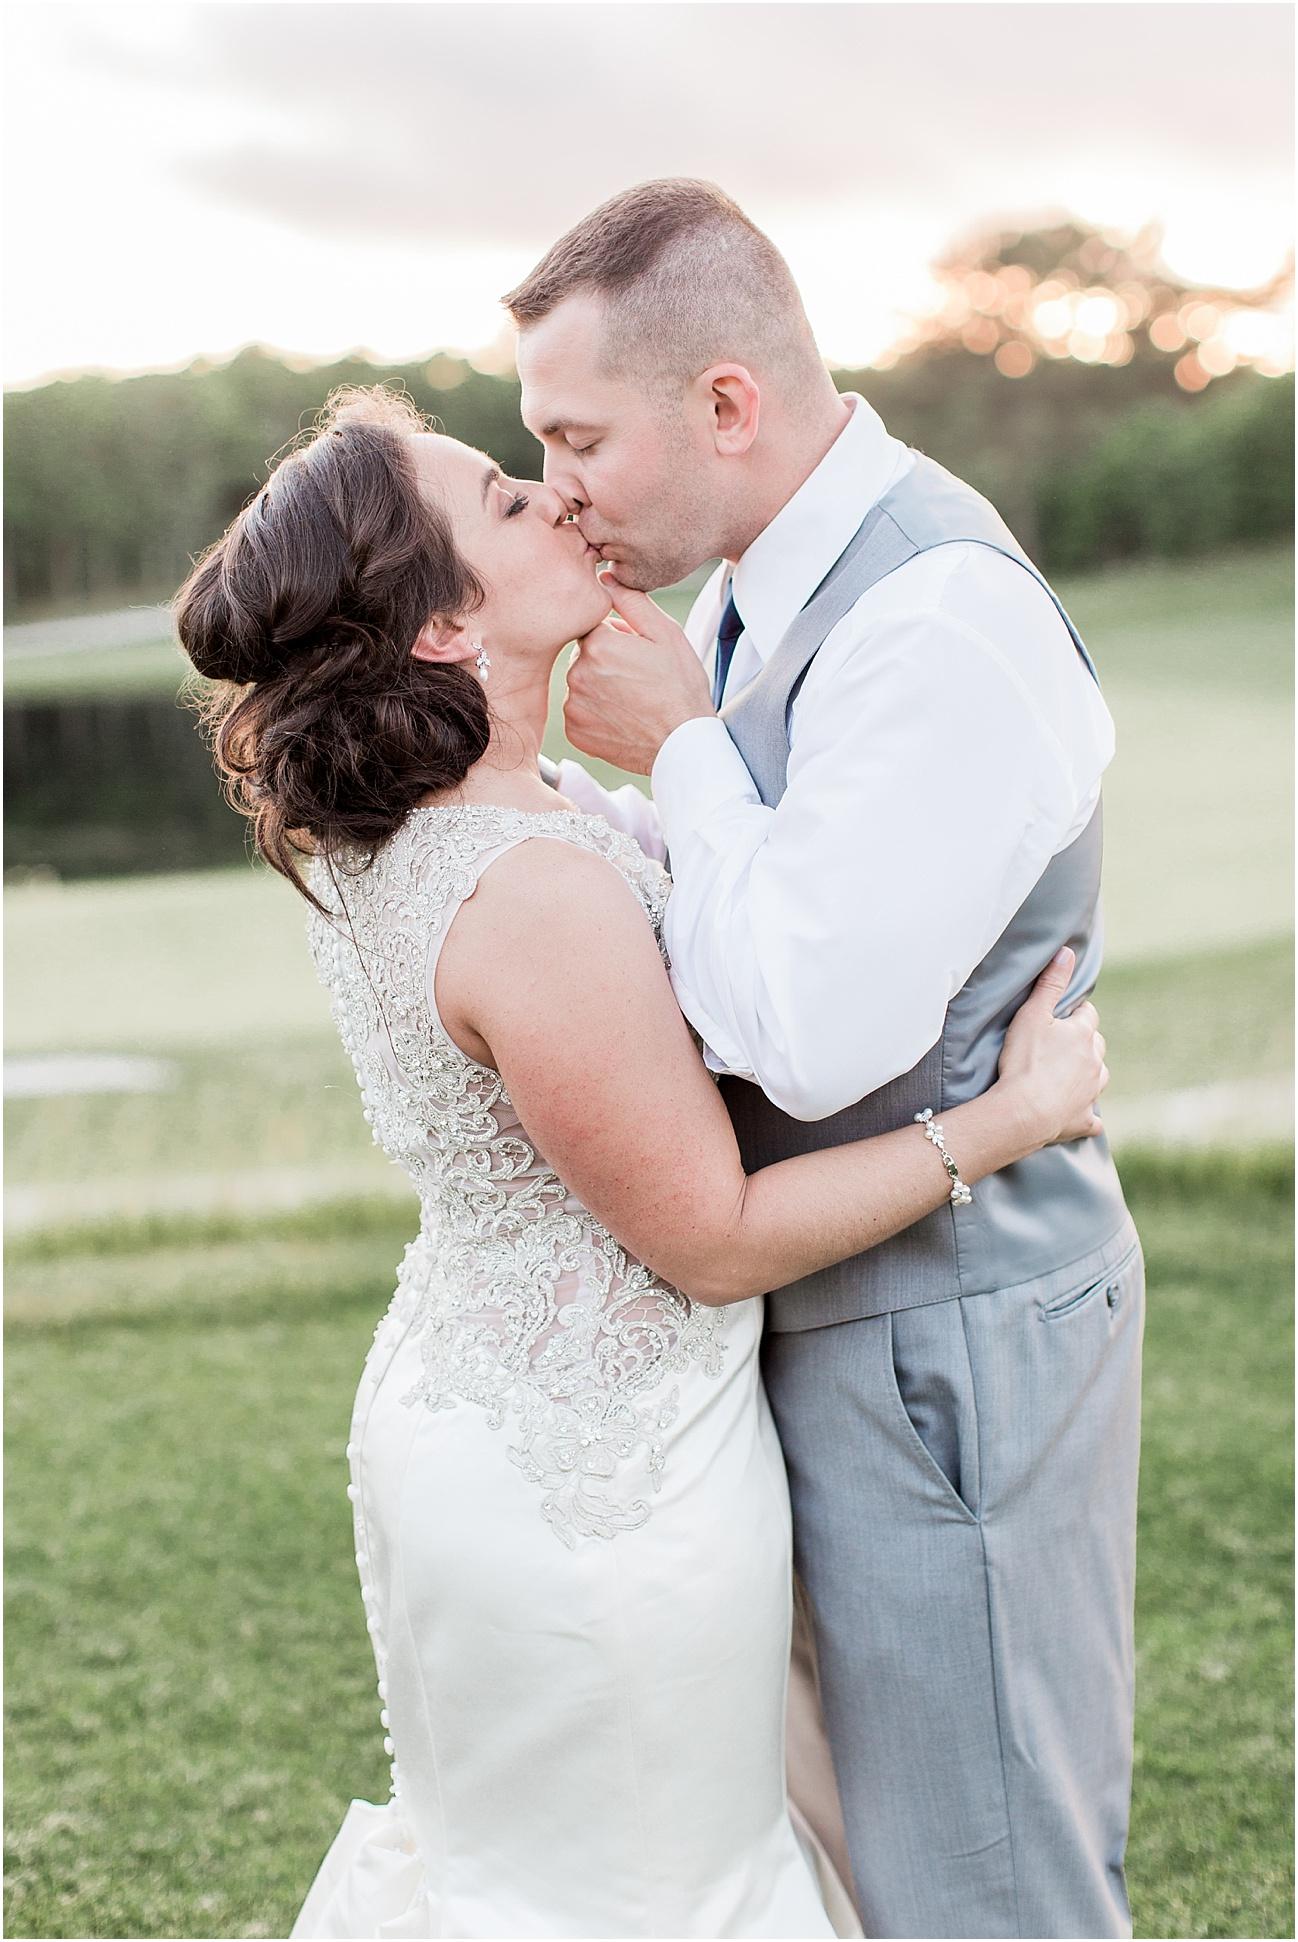 nicole_stephen_cape_club_nicky_falmouth_cod_boston_wedding_photographer_meredith_jane_photography_photo_0200.jpg